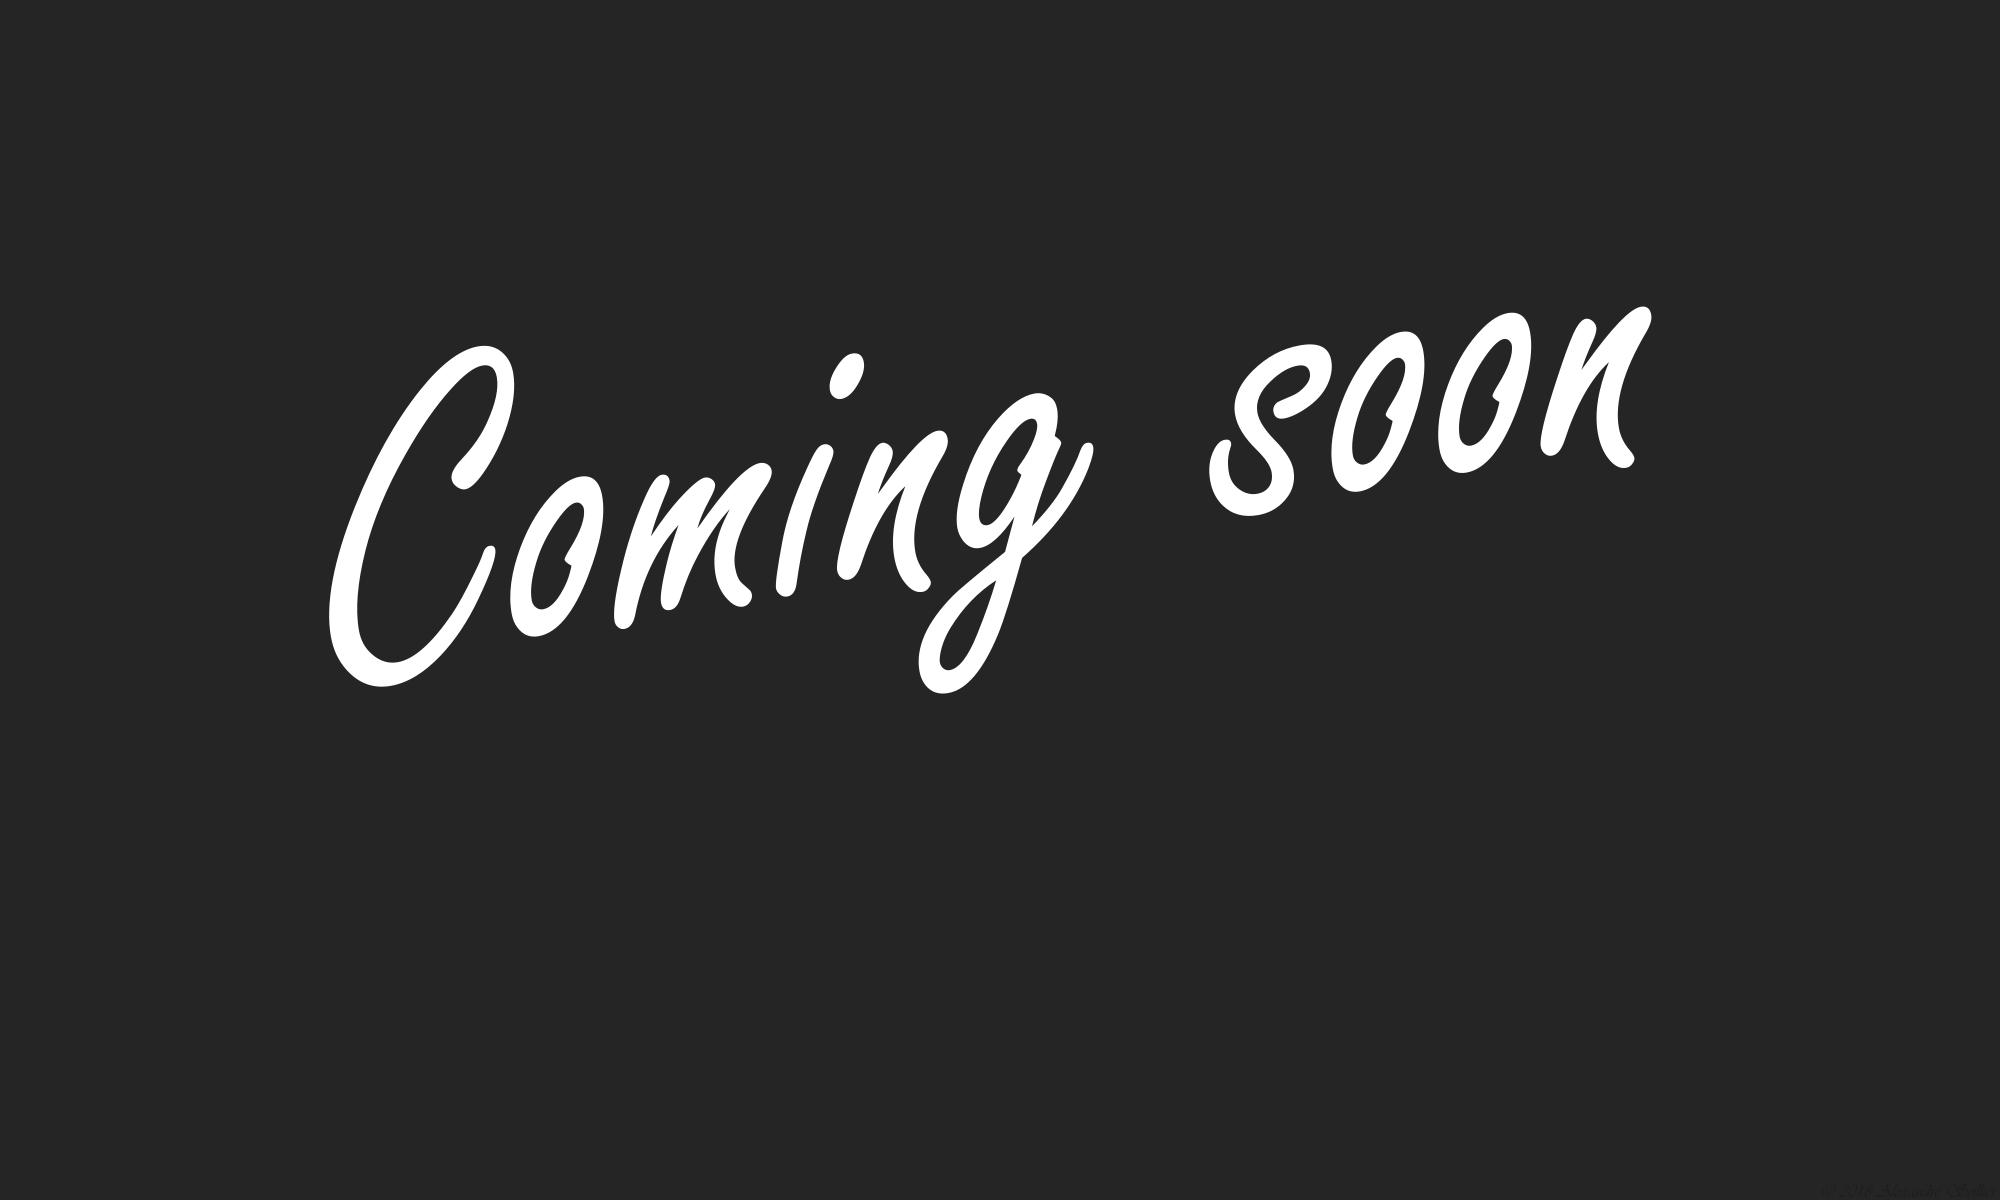 Coming soon on blackboard background